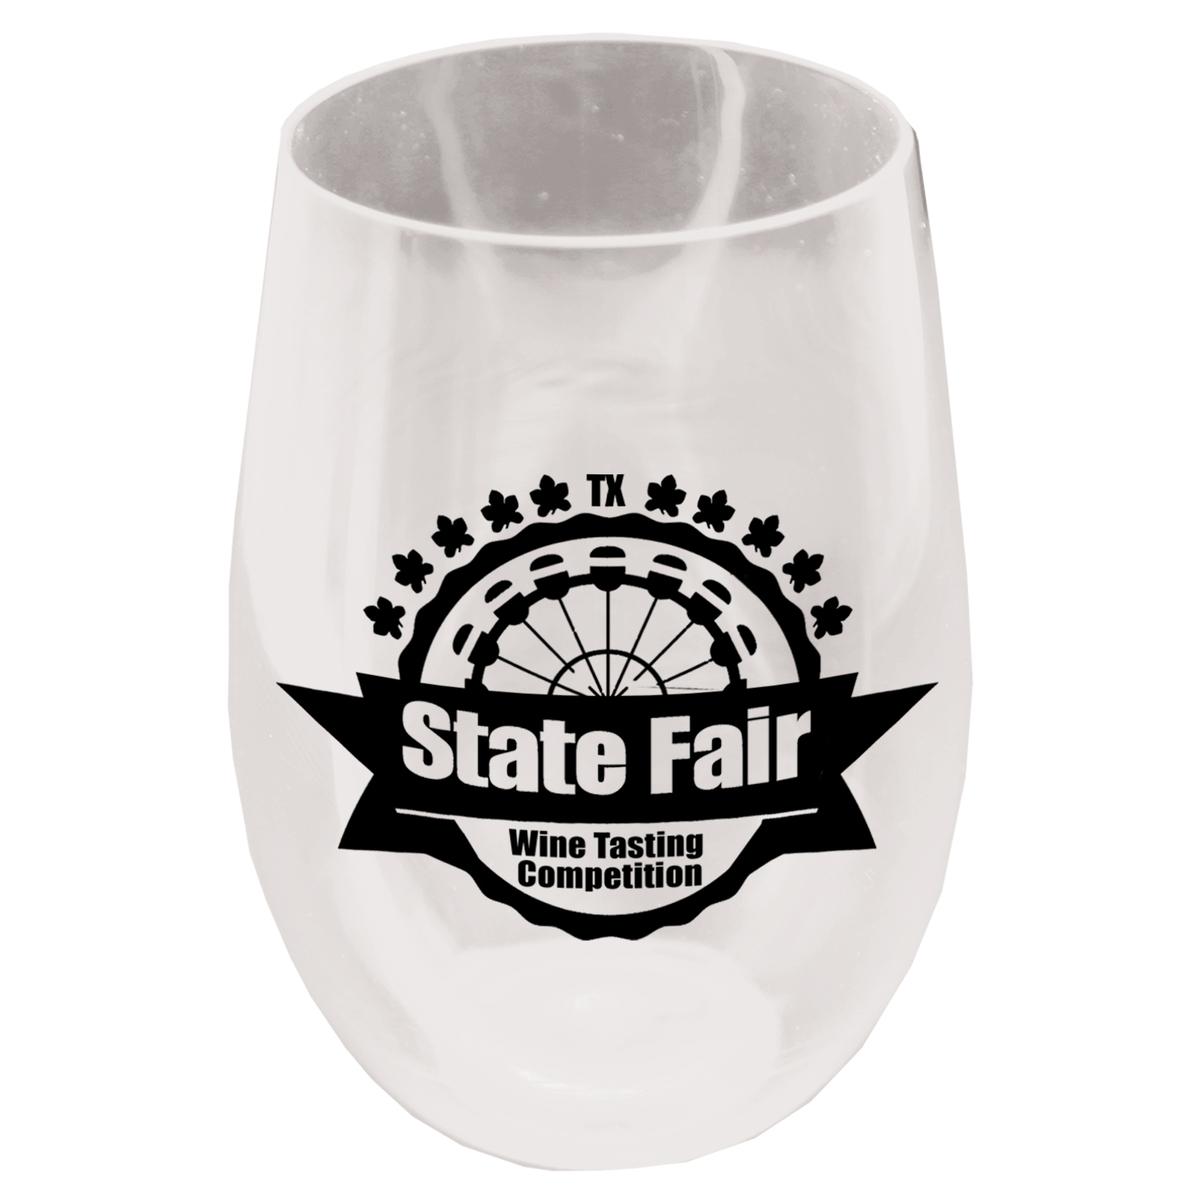 The Vino Clear - 16 oz. Wine Glass